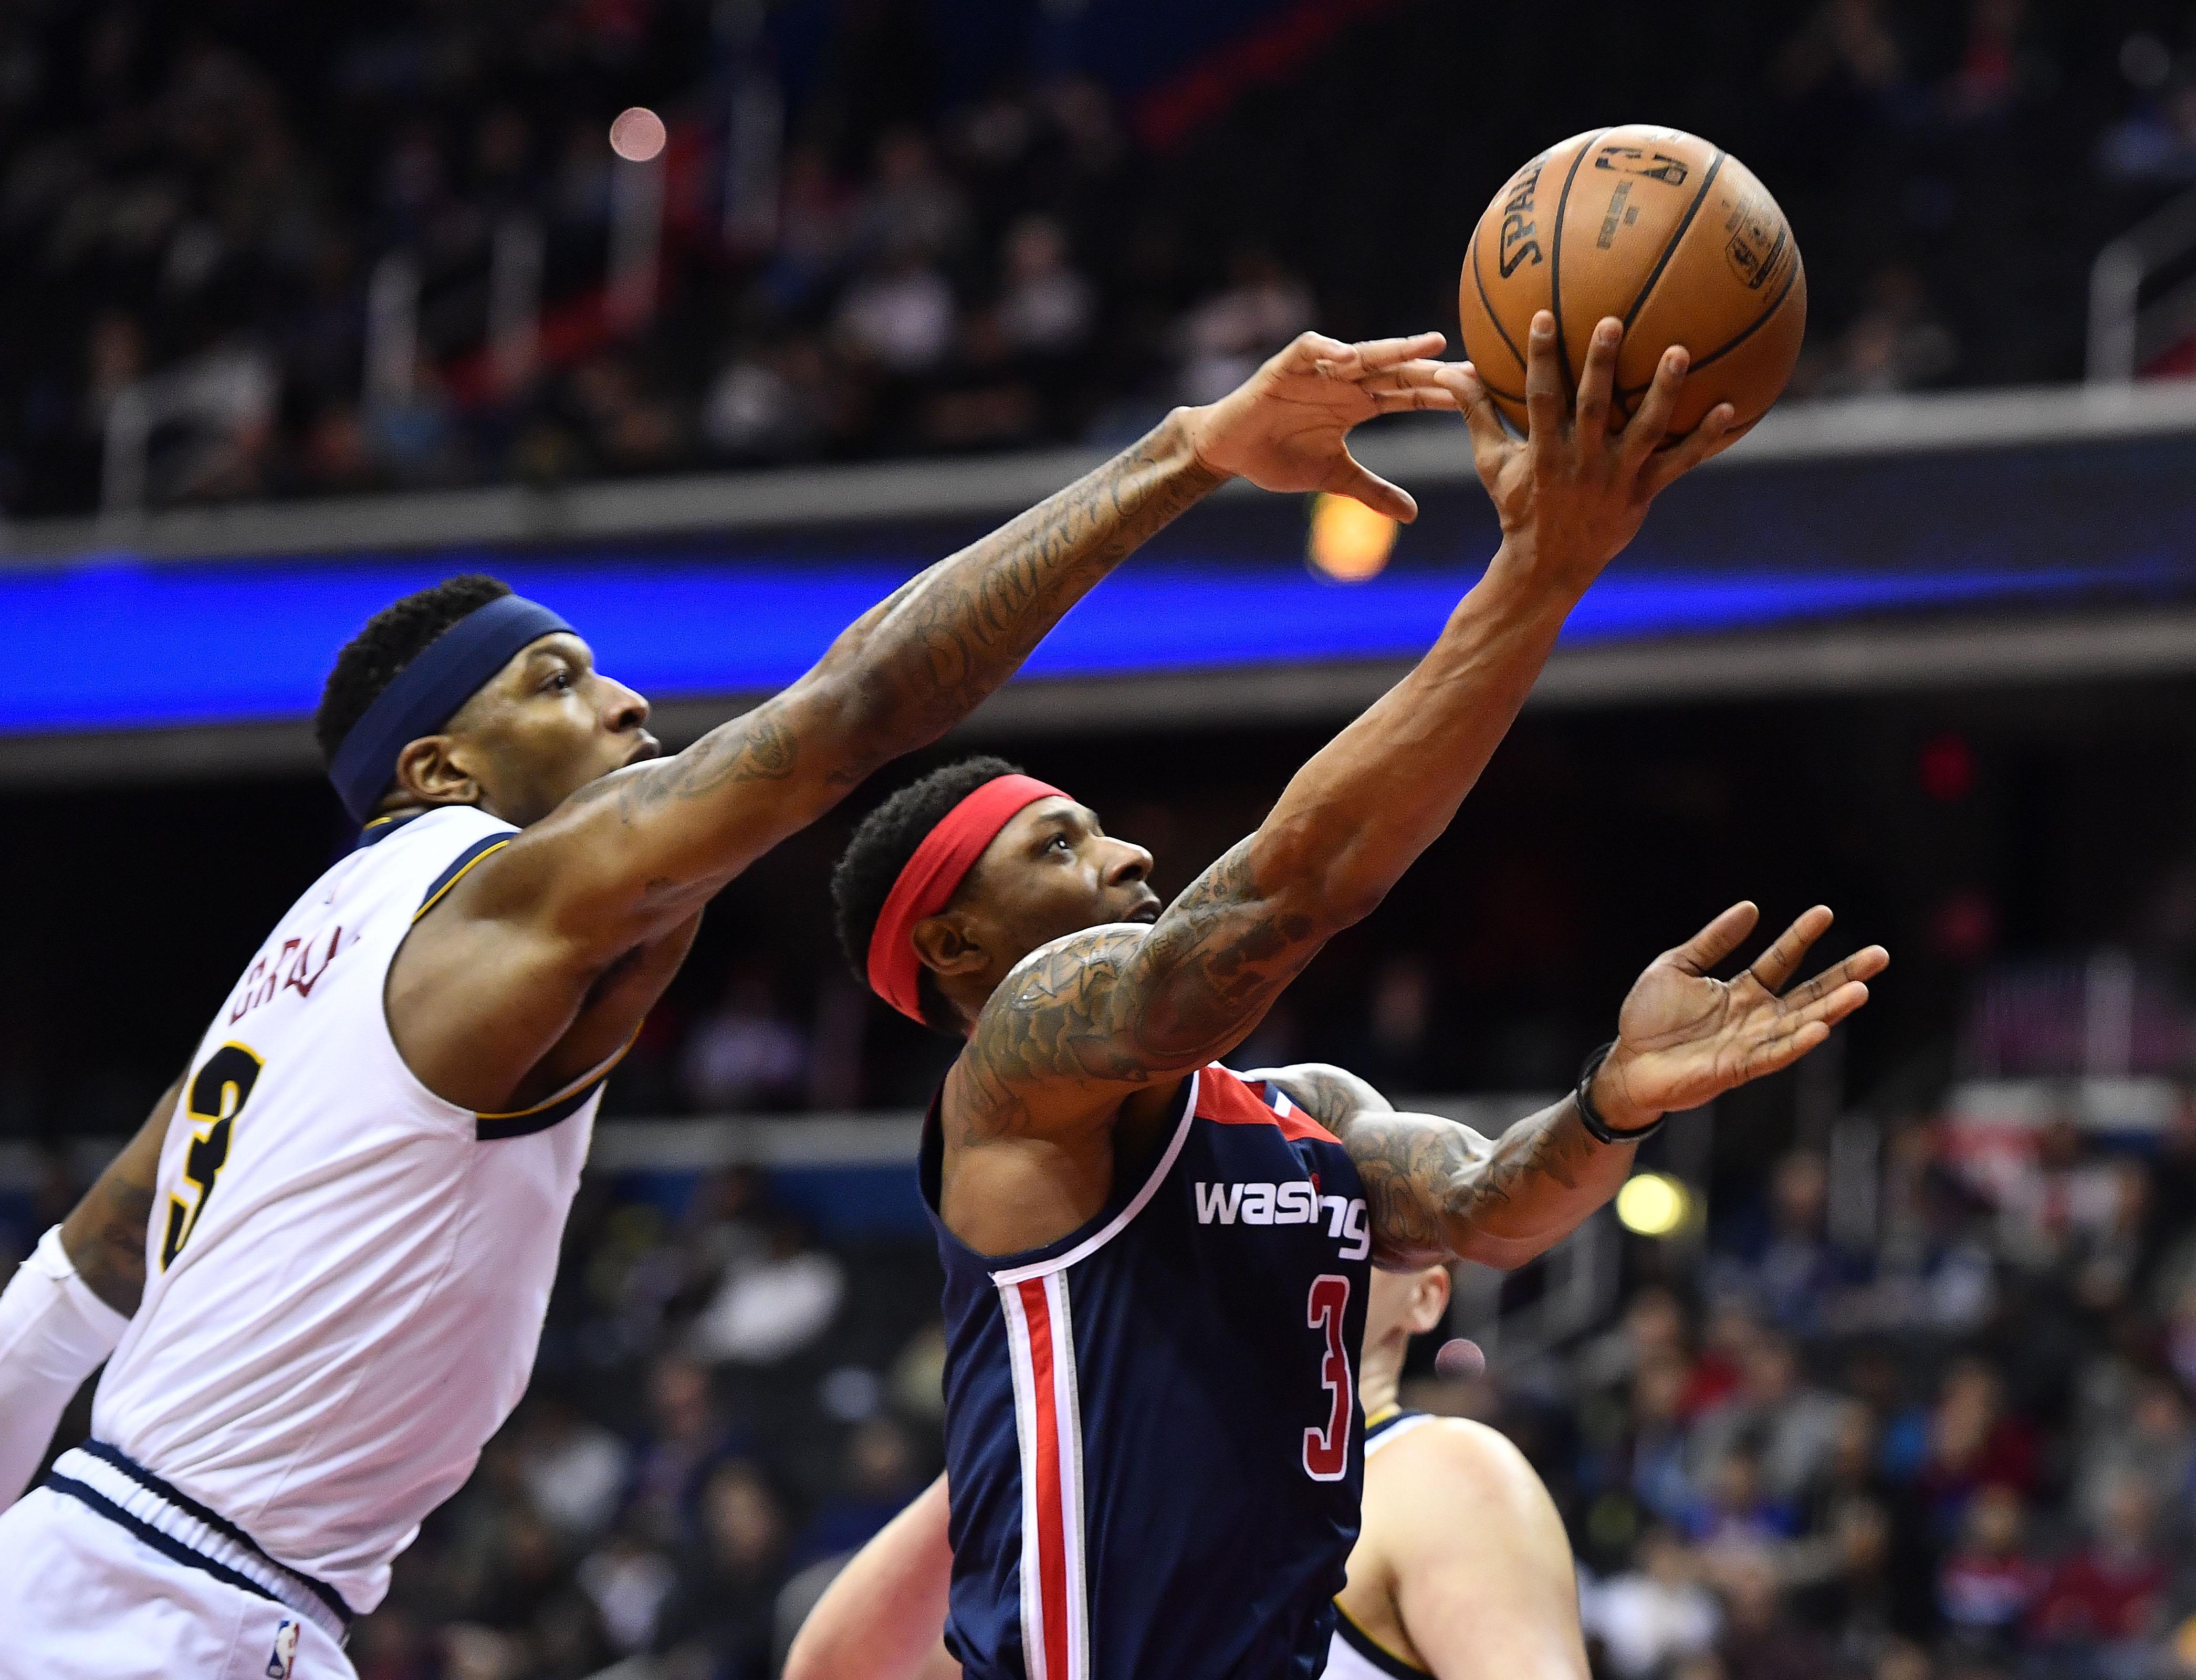 Washington, DC, USA; Washington Wizards guard Bradley Beal (3) shoots as Denver Nuggets forward Torrey Craig (3) defends during the second half at Capital One Arena.